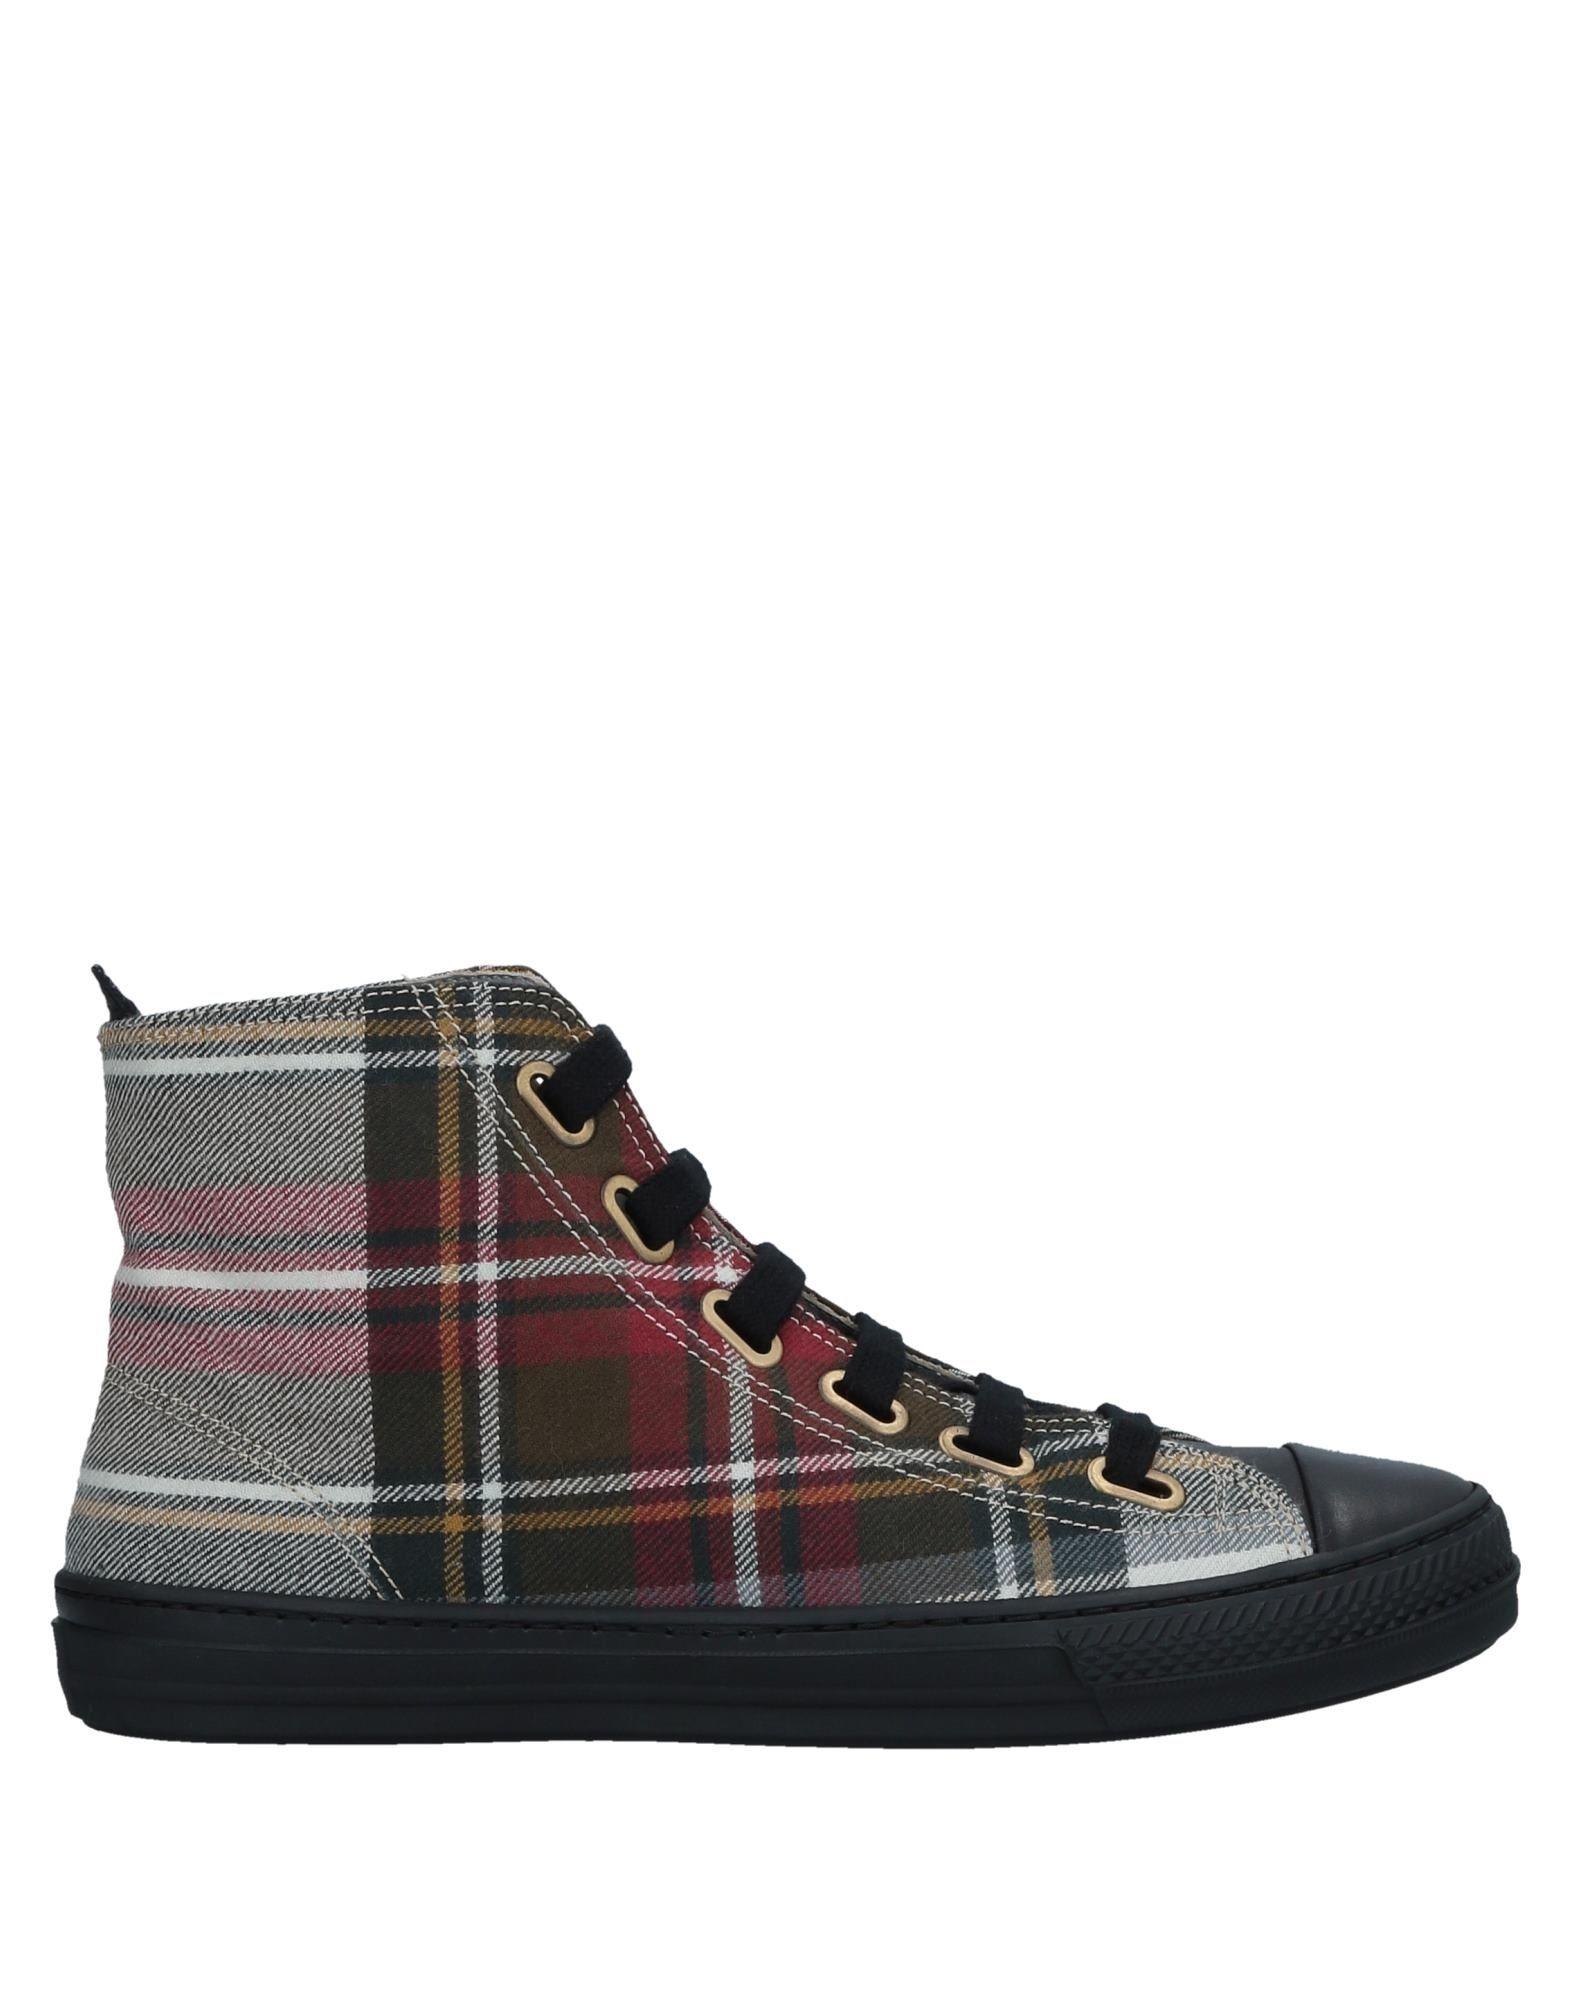 Vivienne Westwood Sneakers Herren  11521583MC Gute Qualität beliebte Schuhe